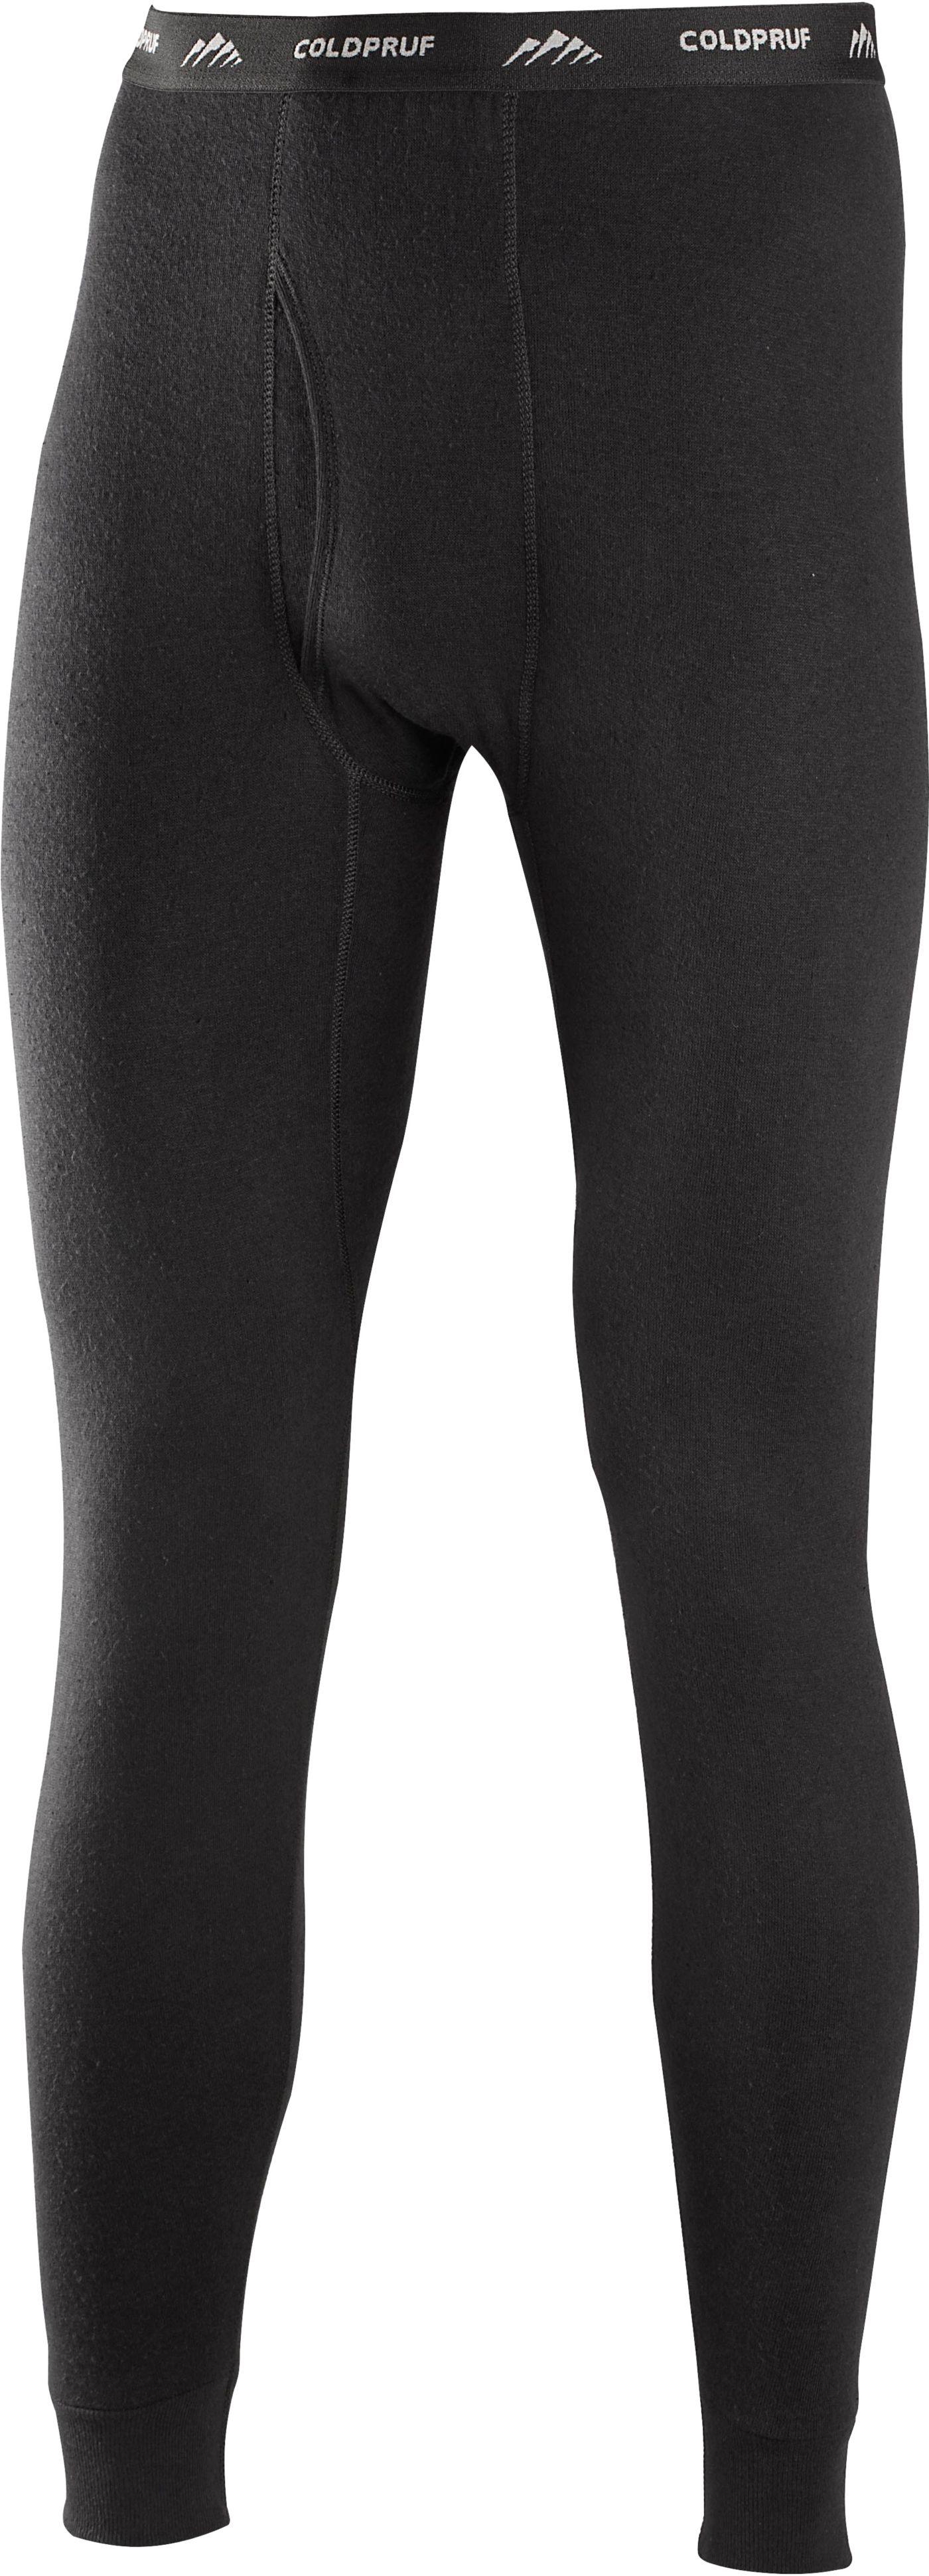 ColdPruf Men's Basic Base Layer Leggings